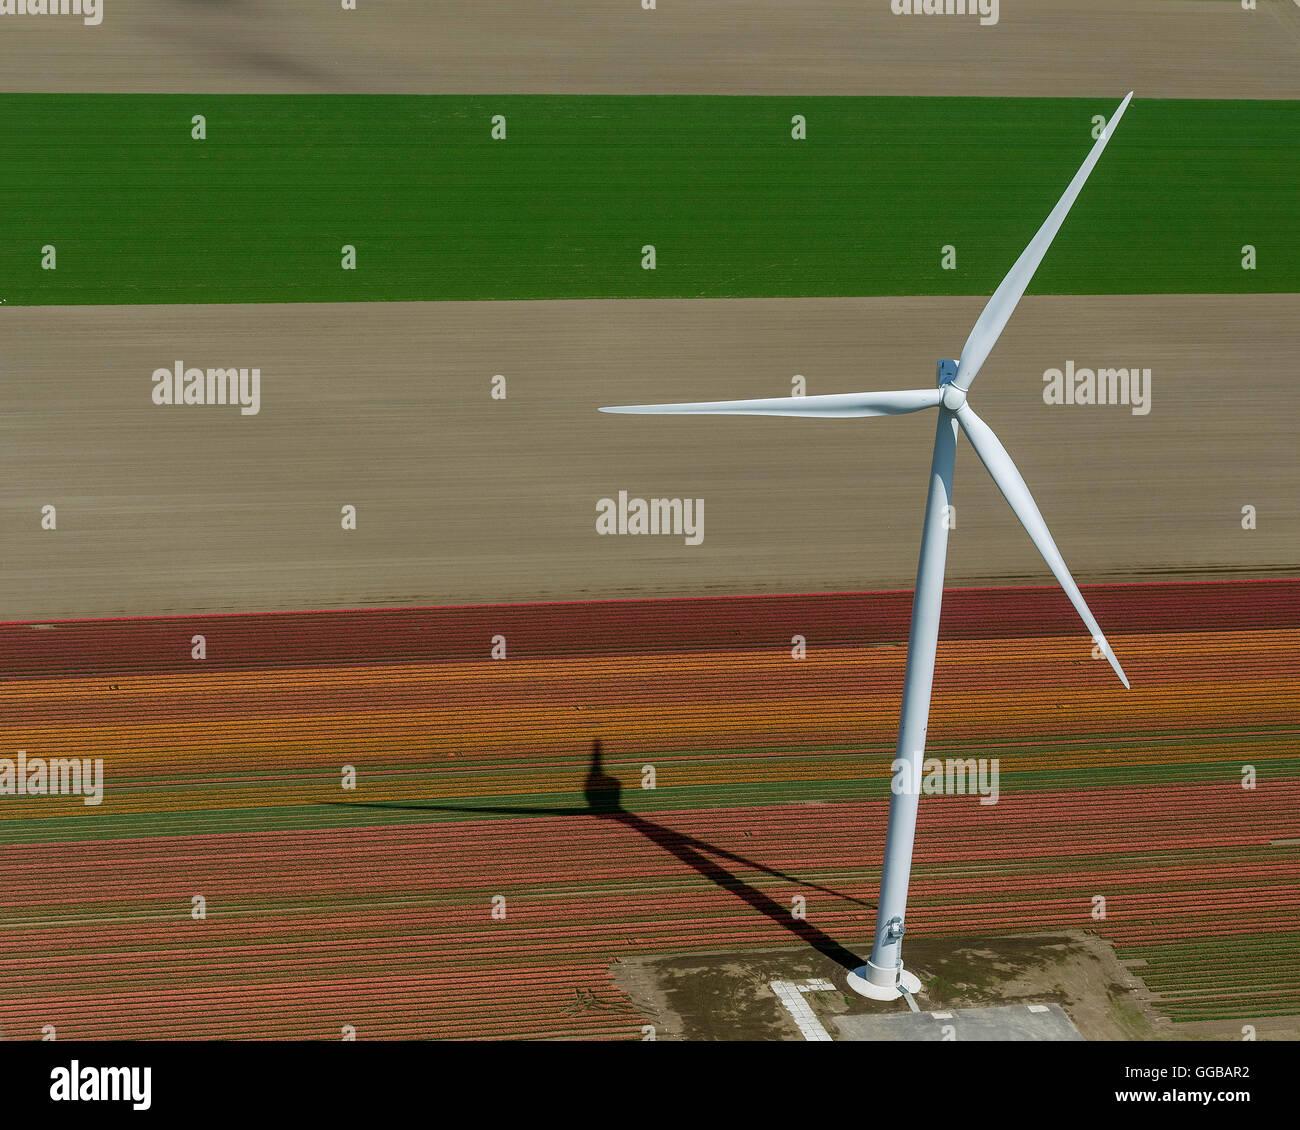 Vista aérea, turbinas eólicas, energía eólica, campos de tulipanes, agricultura, coloridos campos Imagen De Stock